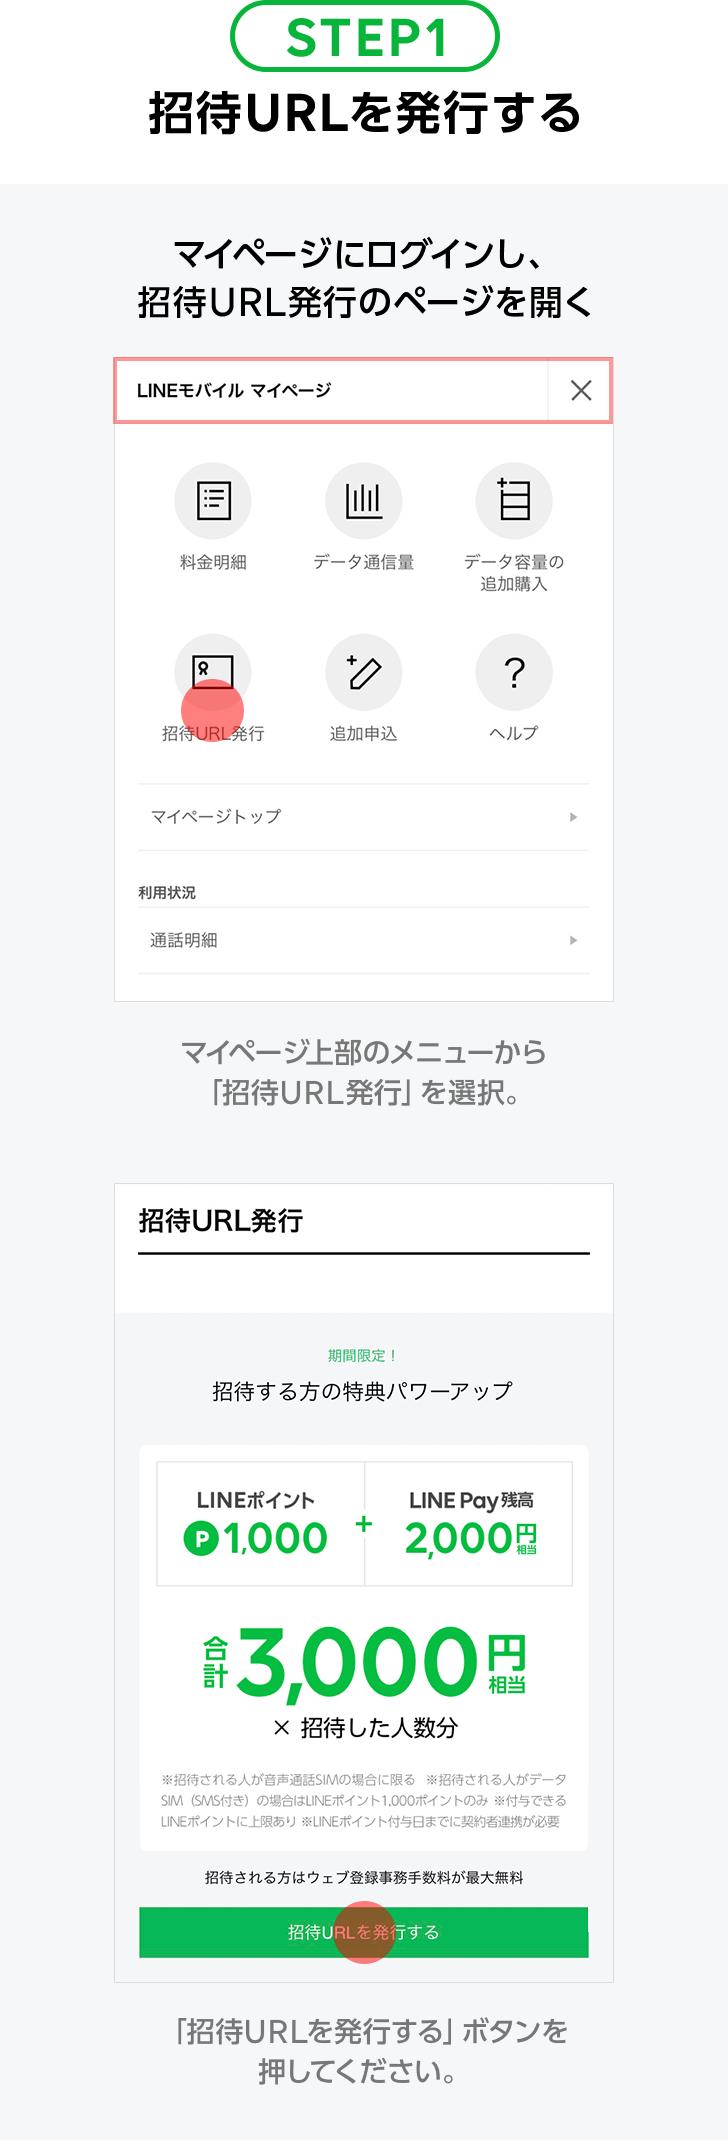 STEP1:招待URLを発行する